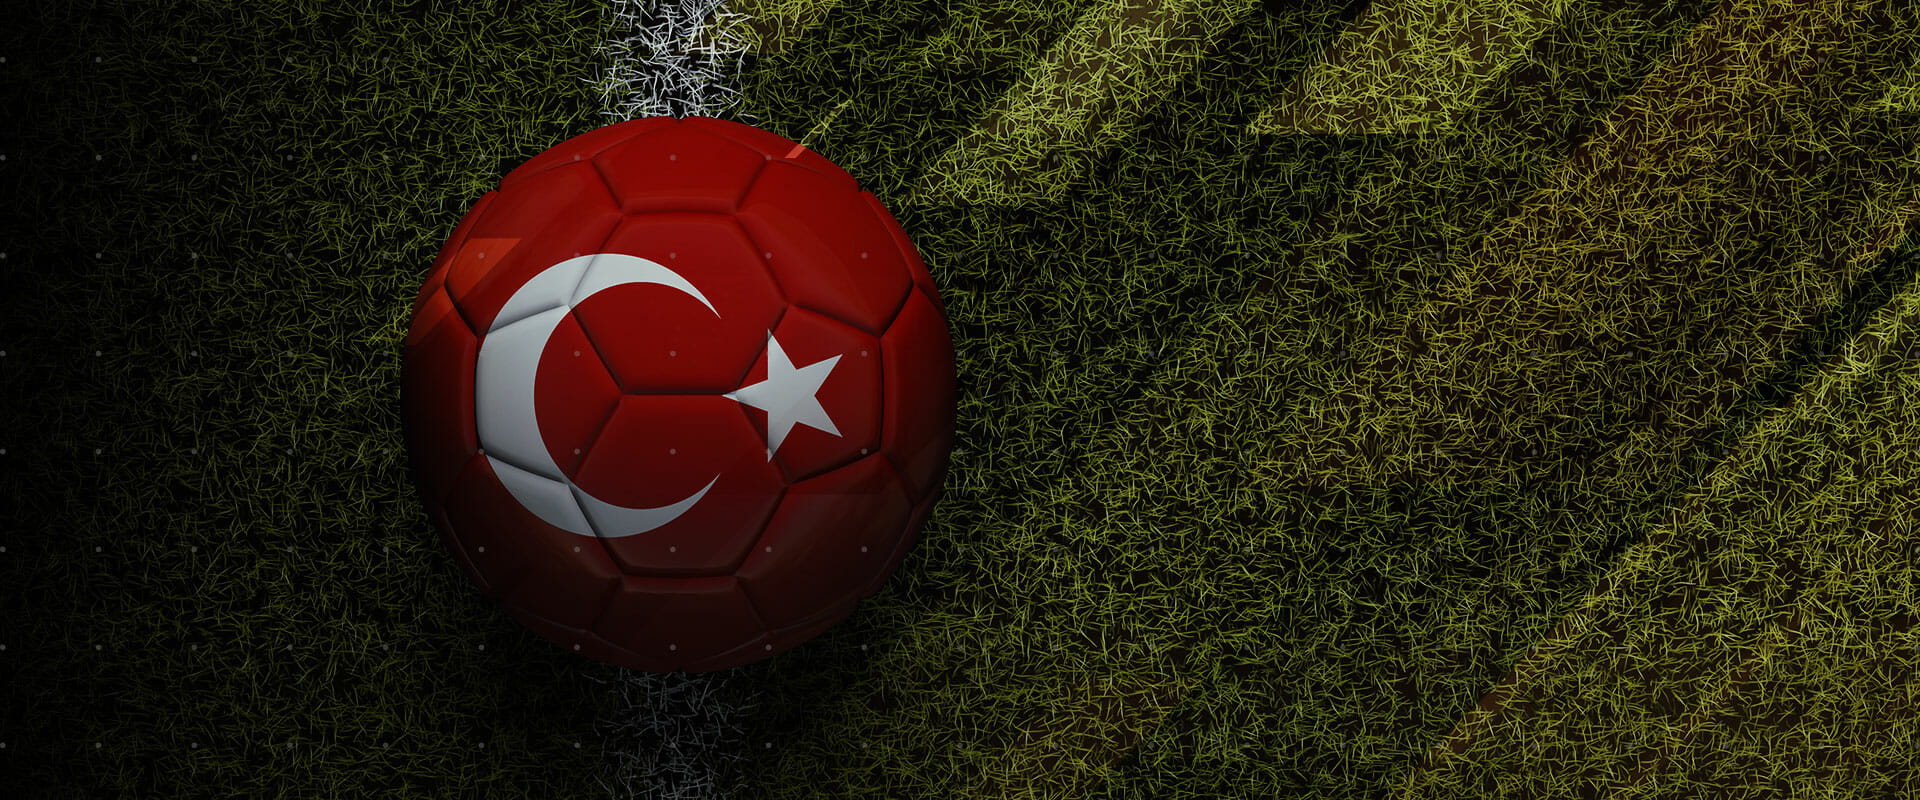 super lig football club report